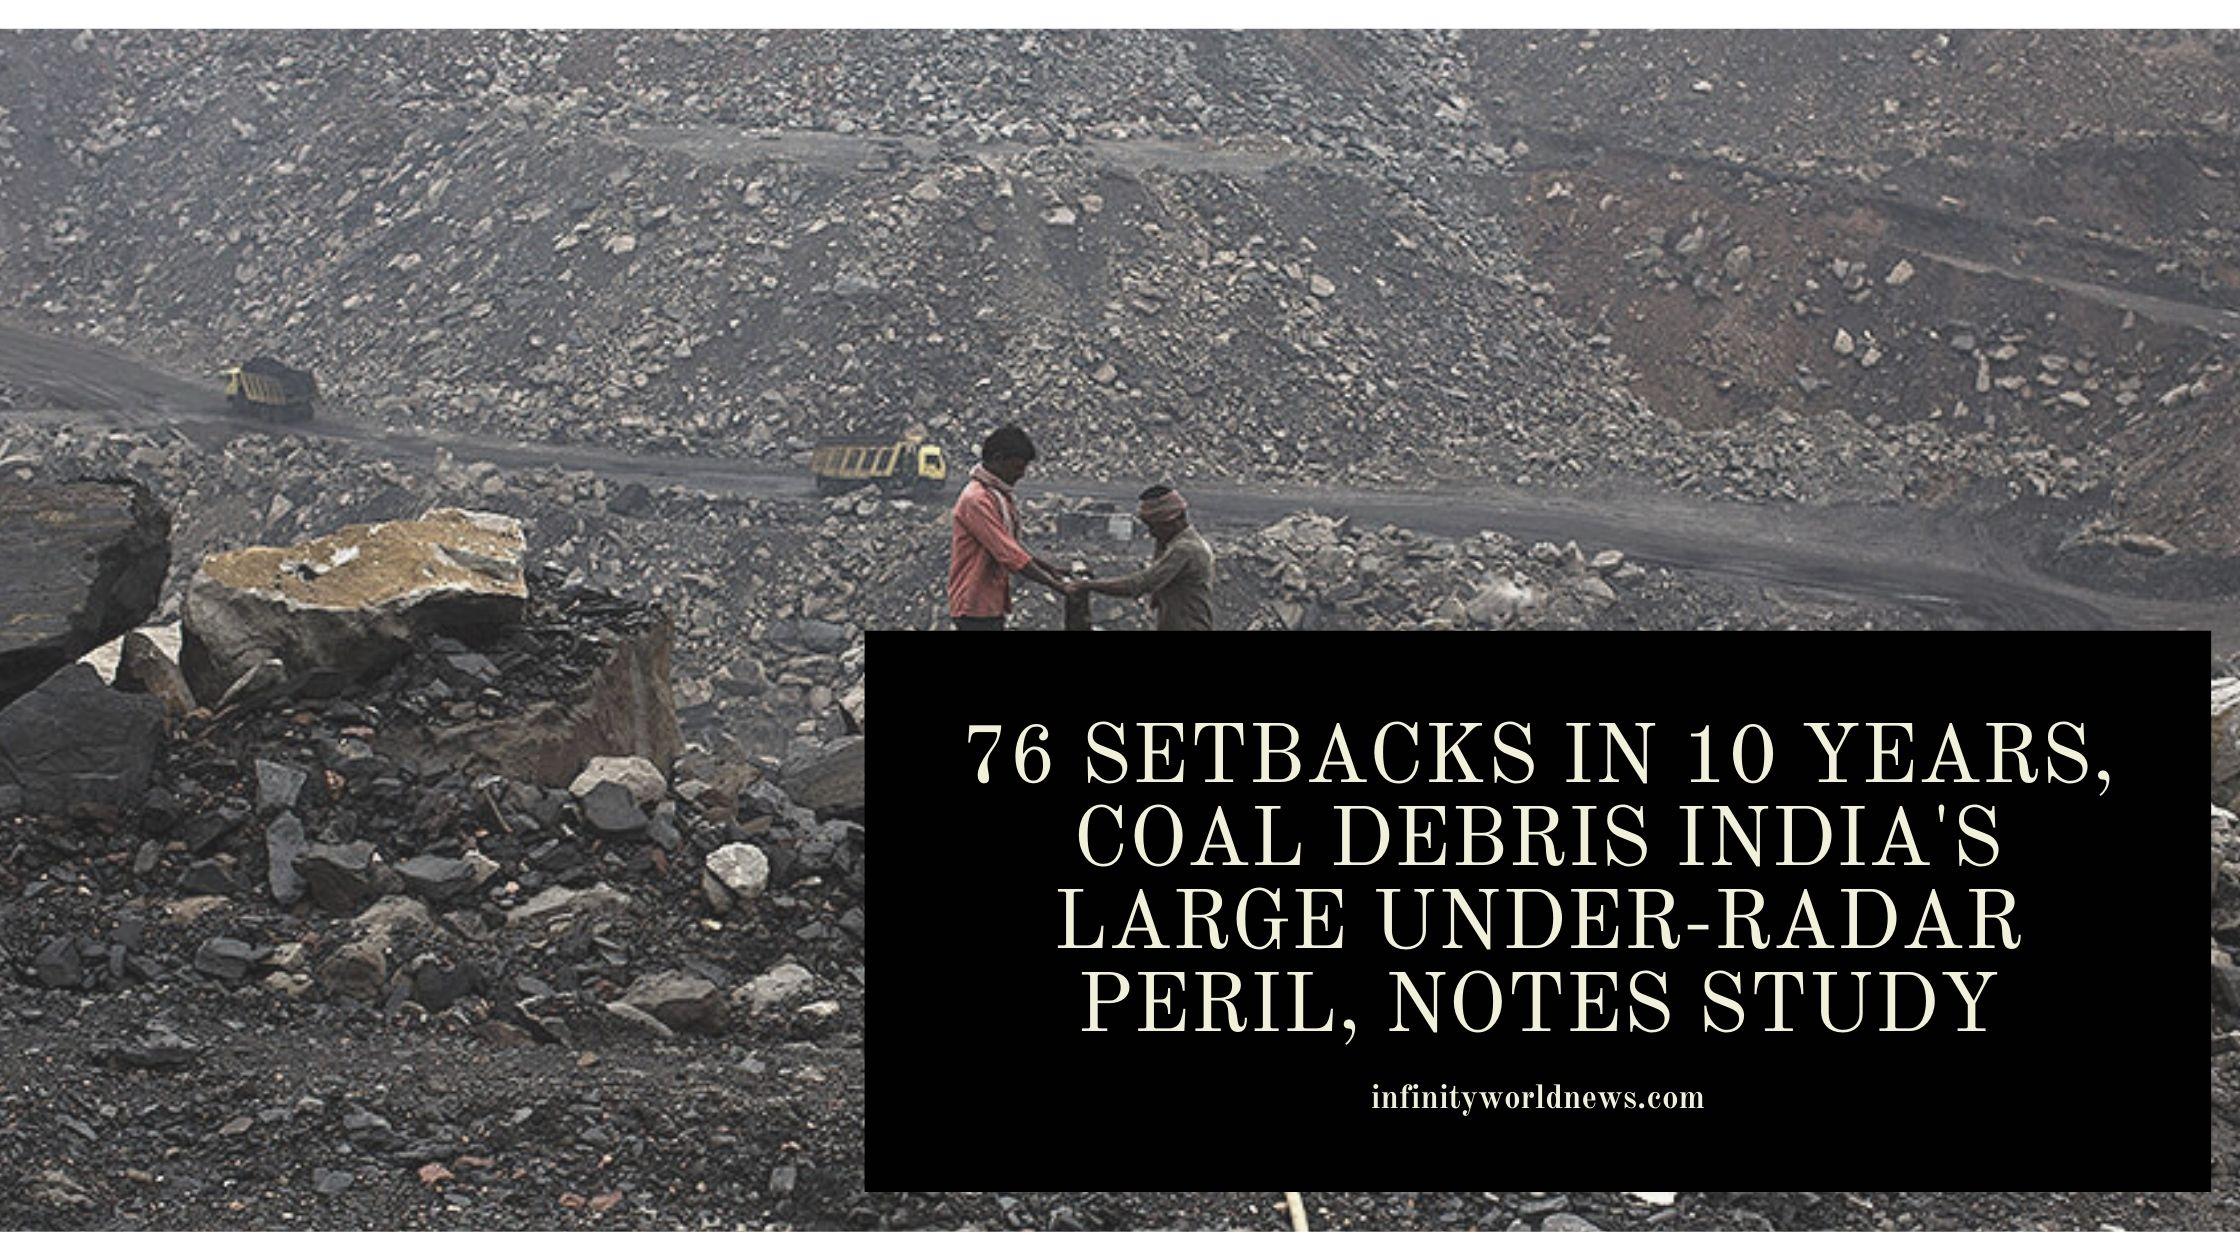 76 setbacks in 10 years, coal debris India's large under-radar peril, notes study